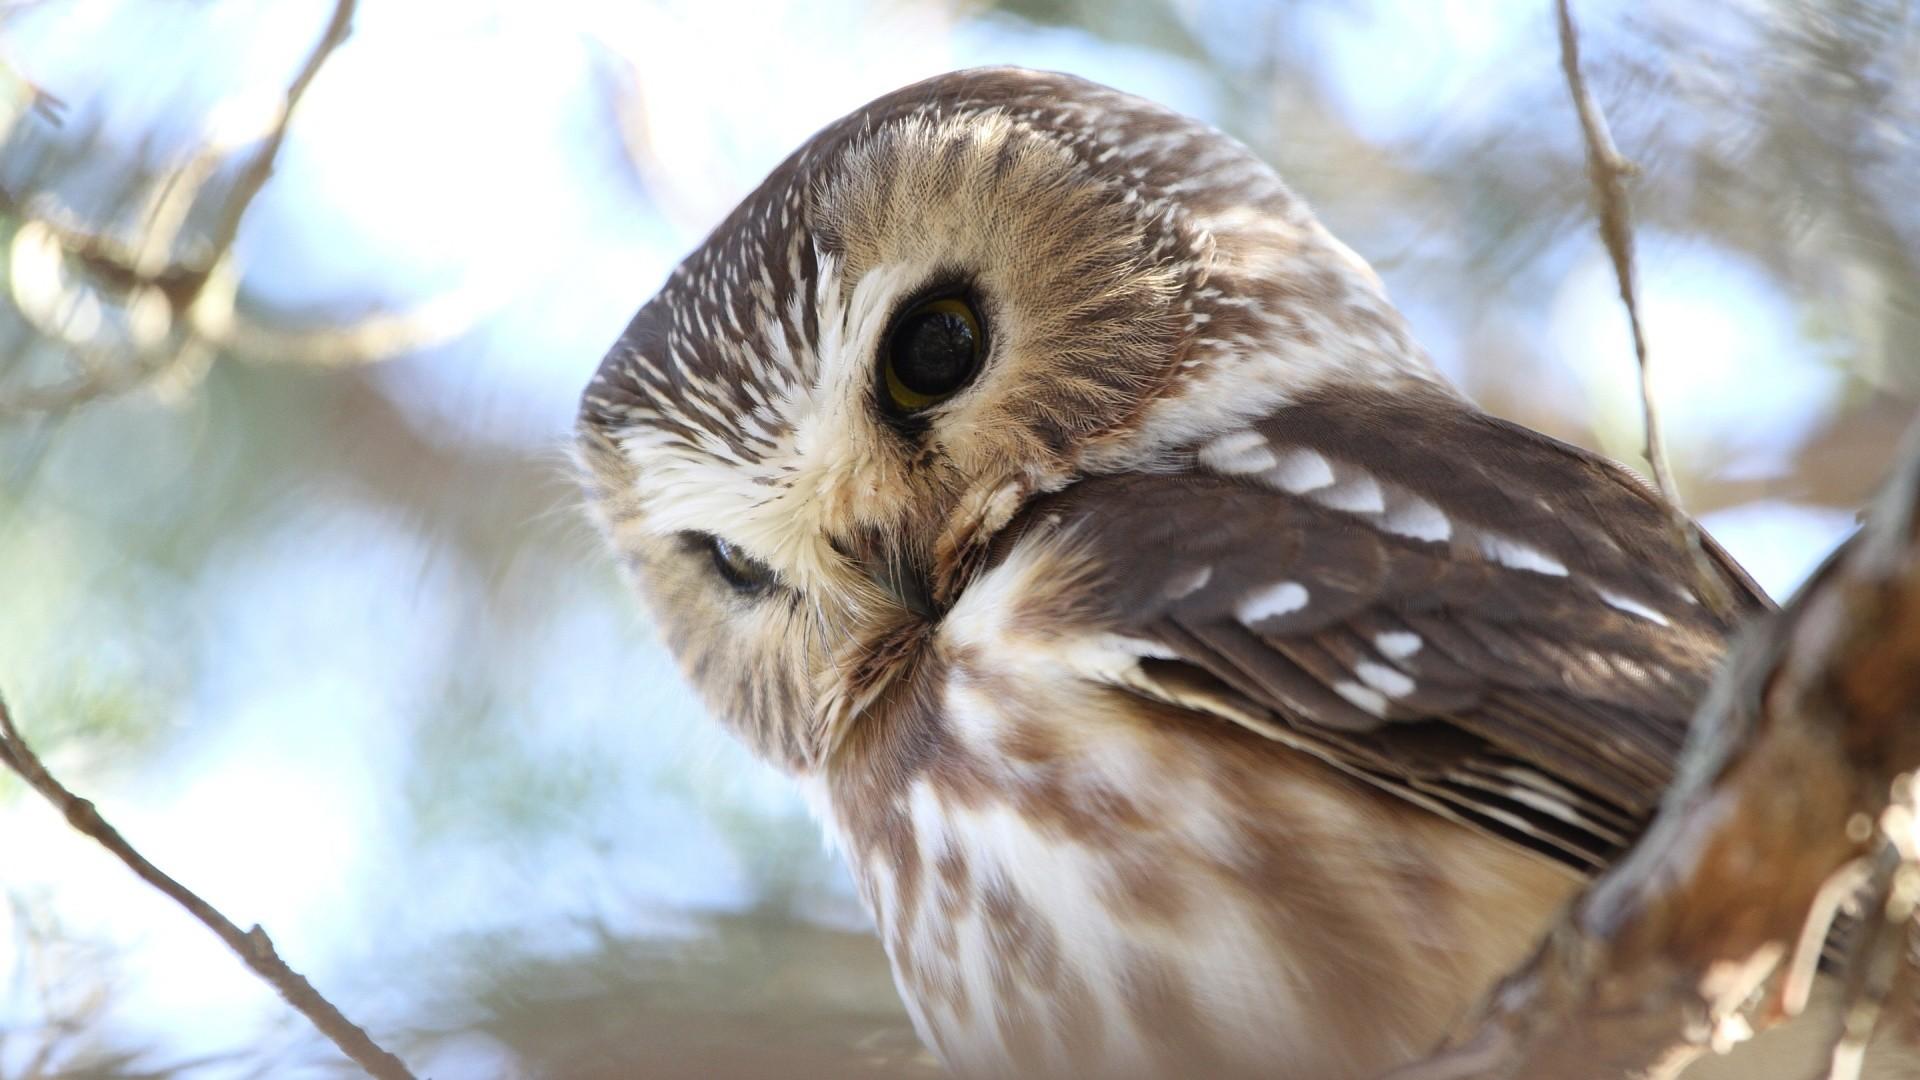 fabulous owl wallpaper x umadcom with owl wallpaper.